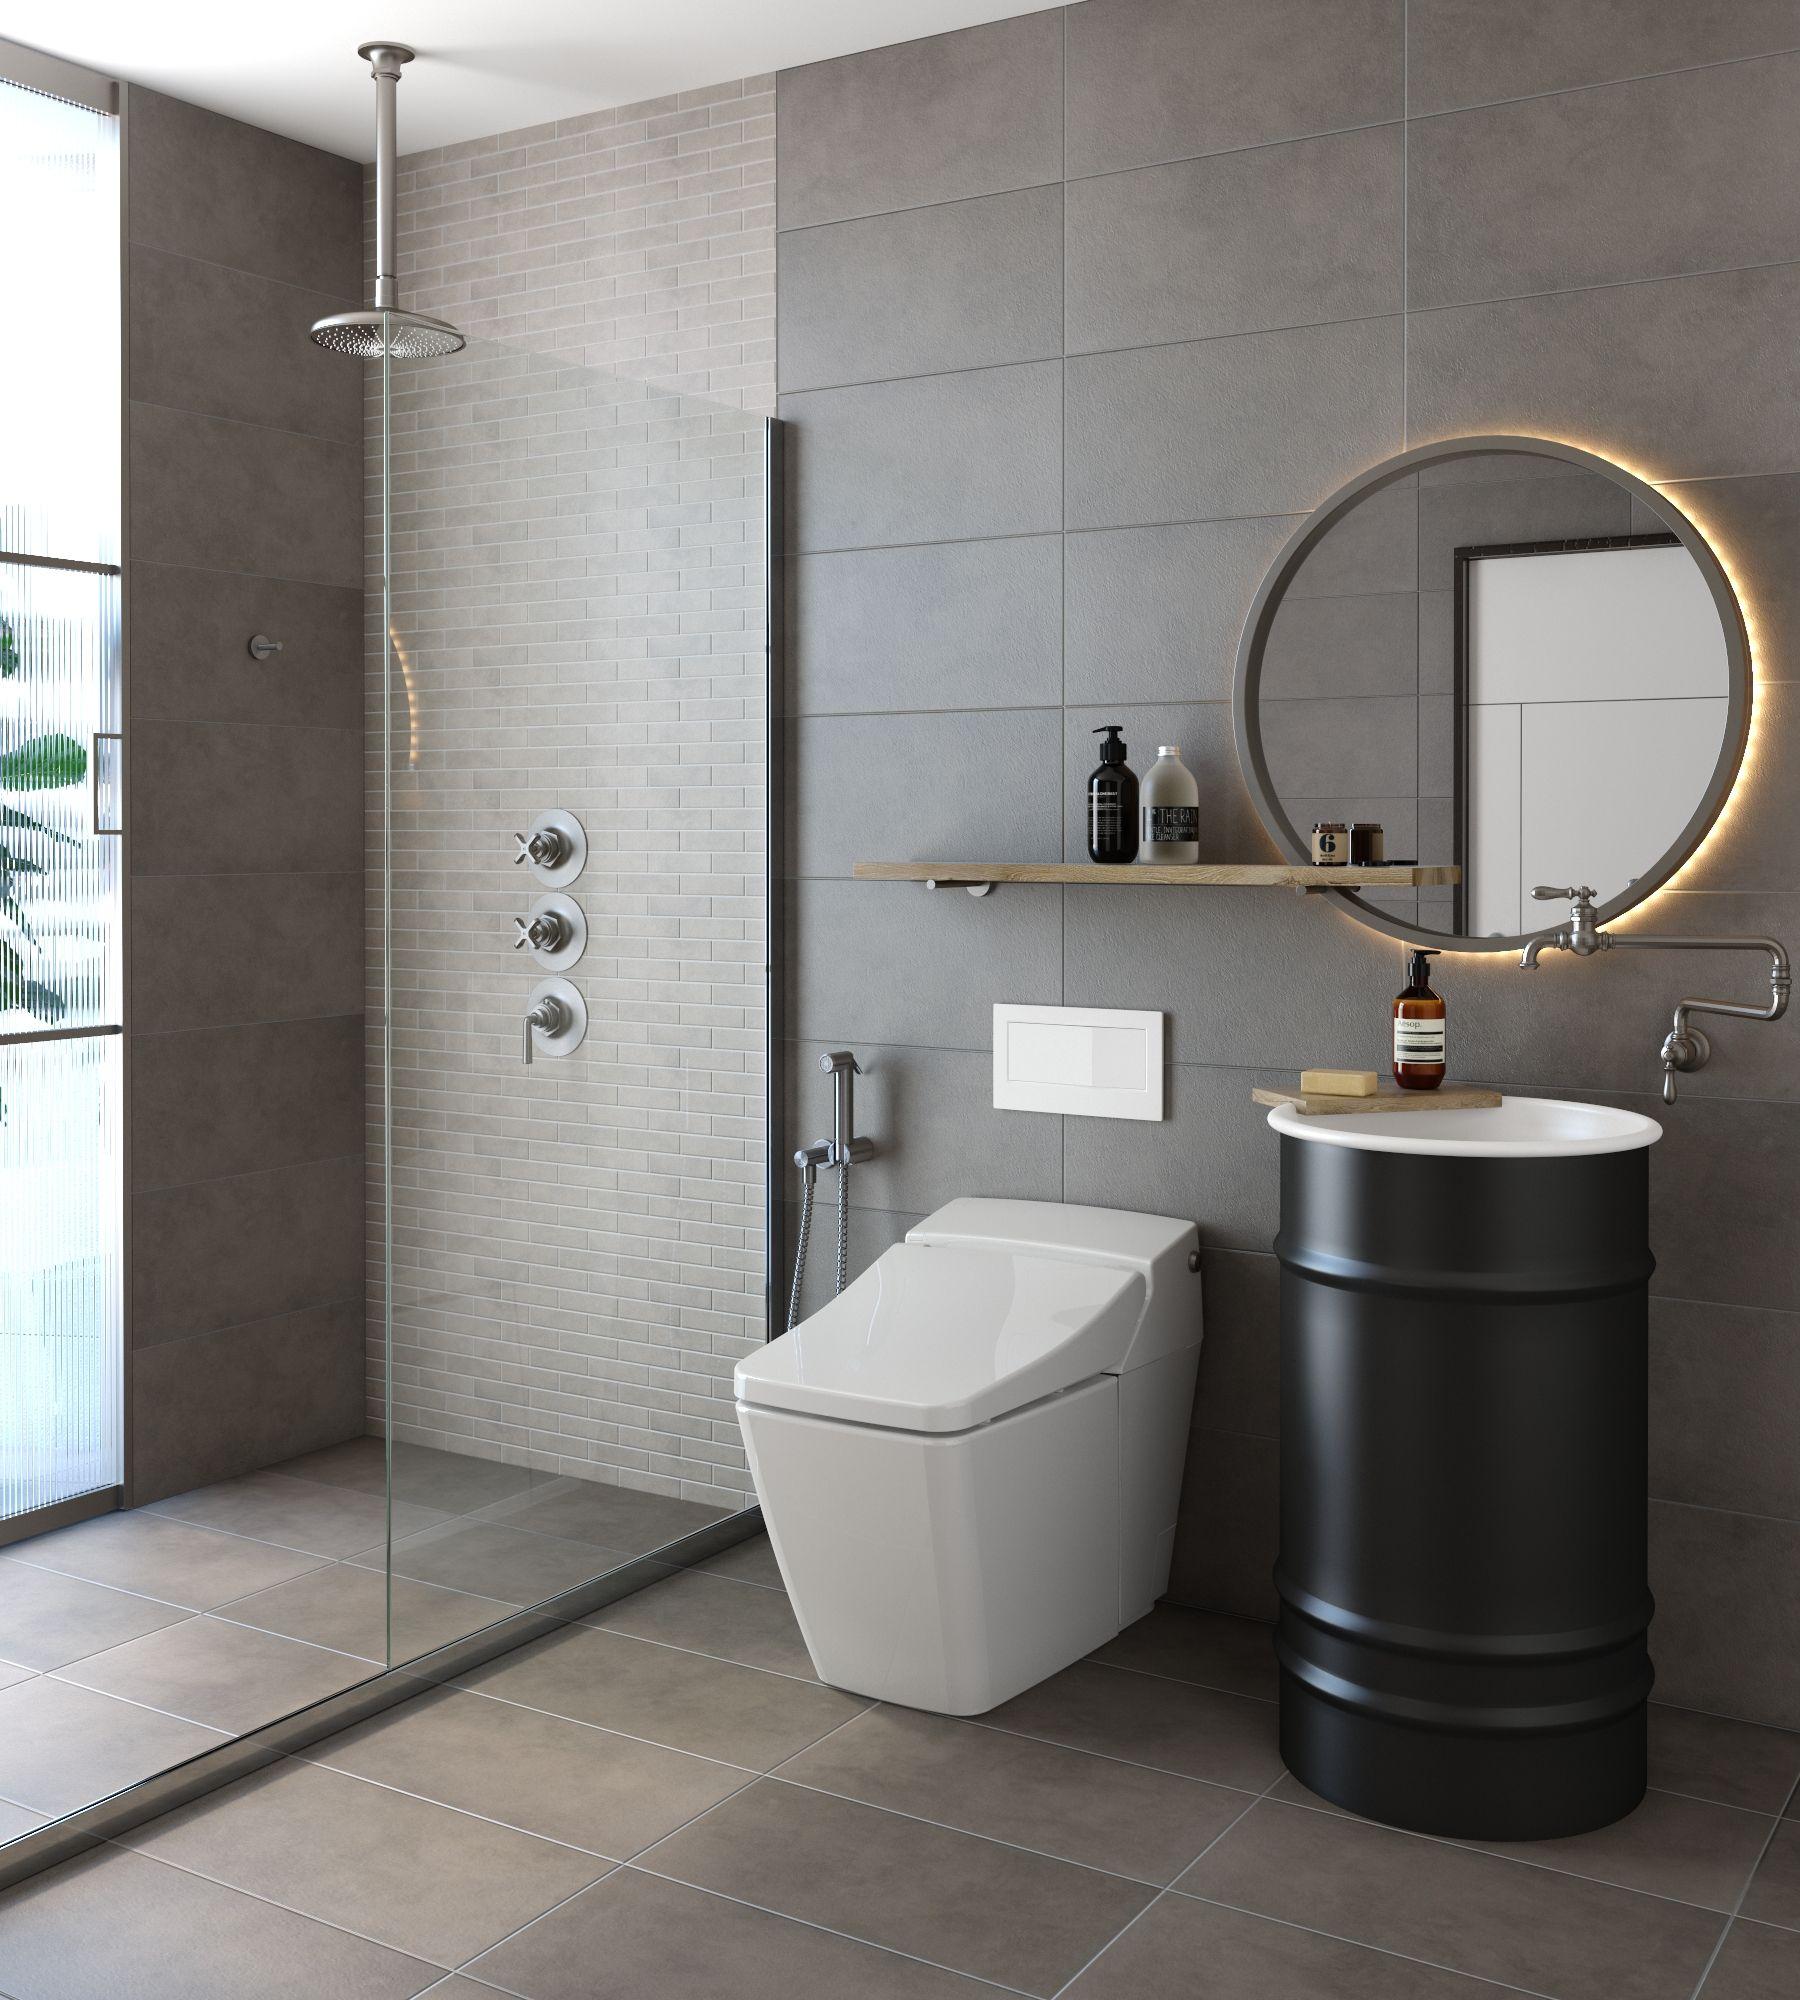 Feruni Decor Cement Bathroom Shower Washroom Toilet Minimalist Modern Porcelain C Washroom Design Ceramic Tile Floor Bathroom Ceramic Tile Bathrooms